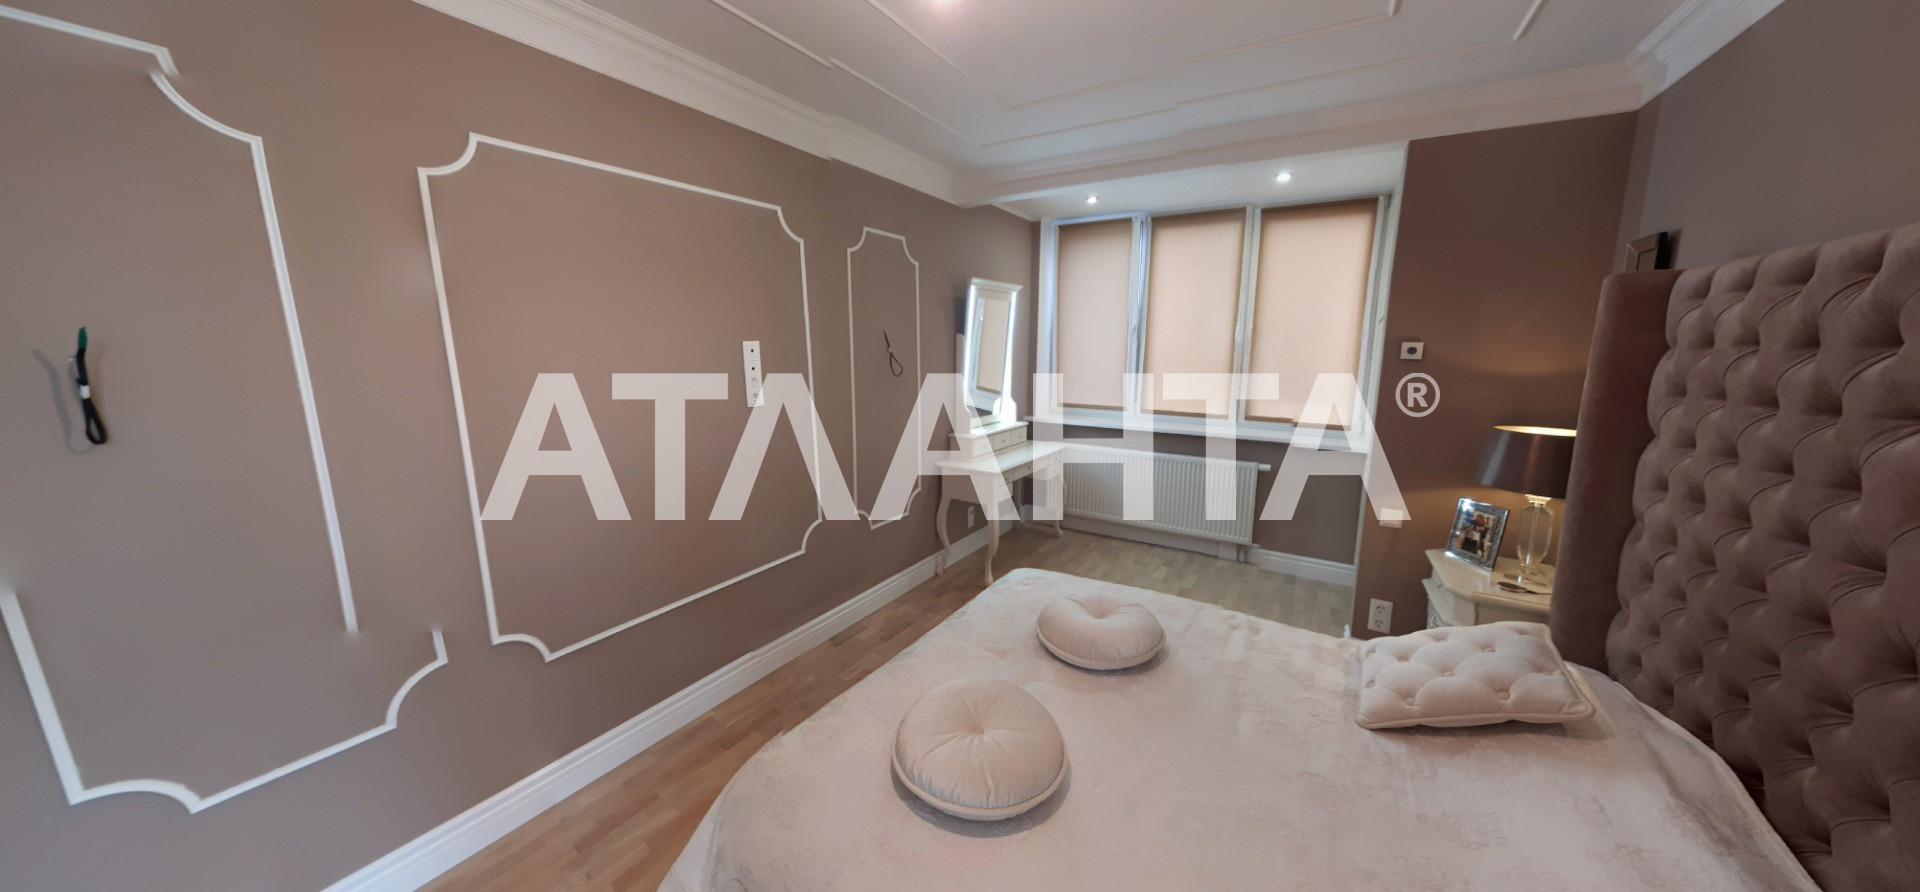 Продается 3-комнатная Квартира на ул. Ул. Ломоносова — 230 000 у.е. (фото №17)